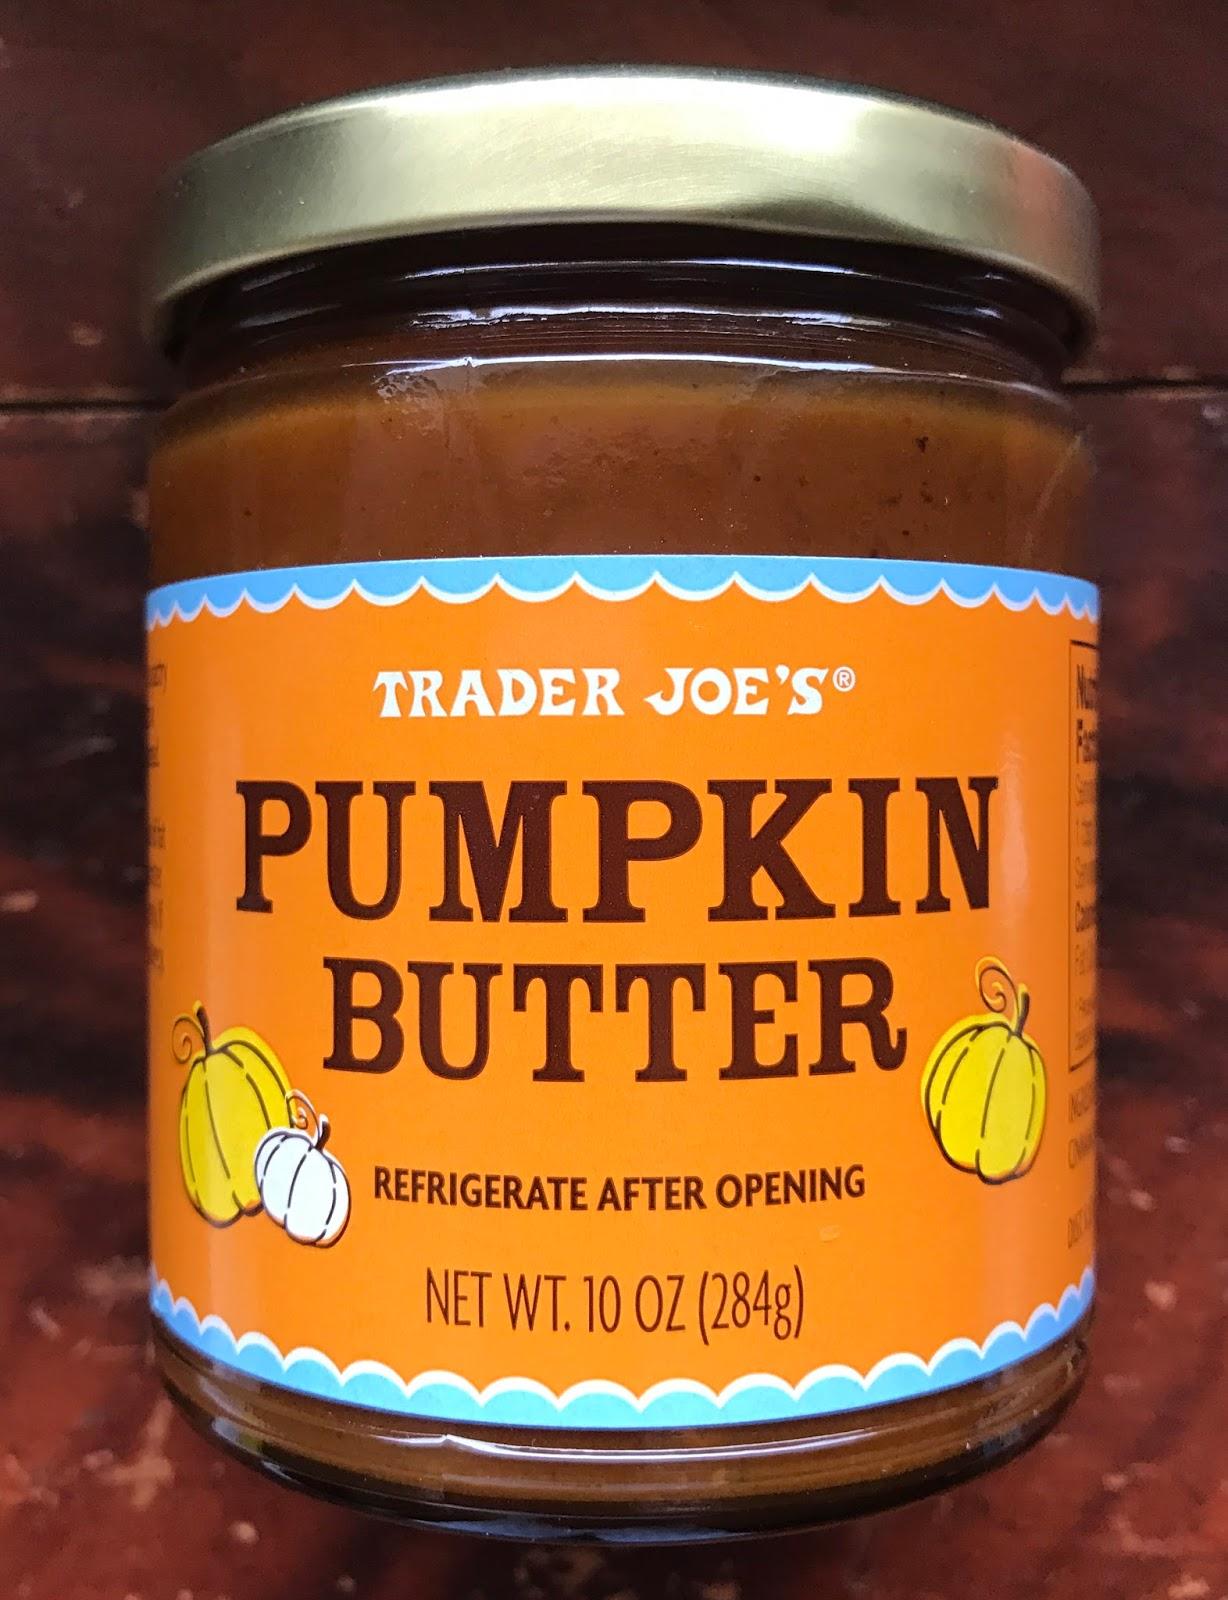 ... Pumpkin Butter, which contains pumpkin, sugar, honey, lemon juice